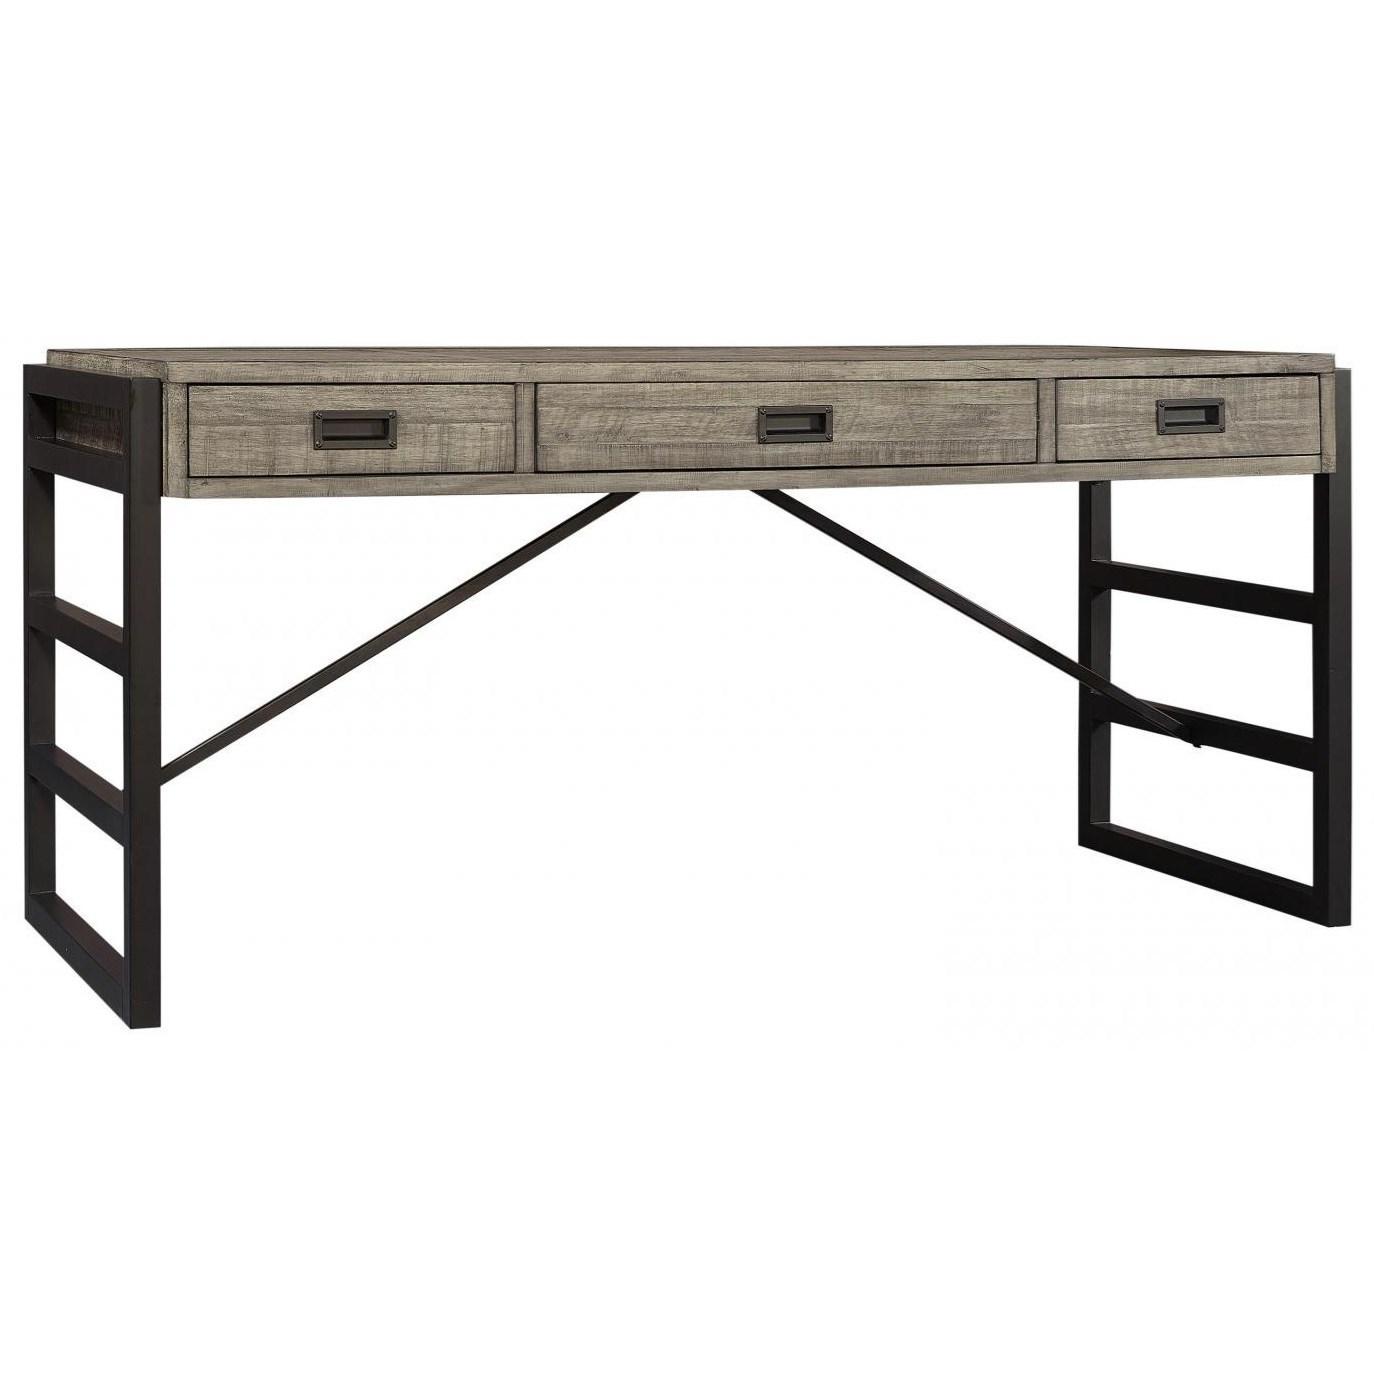 Grayson Desk by Aspenhome at Stoney Creek Furniture